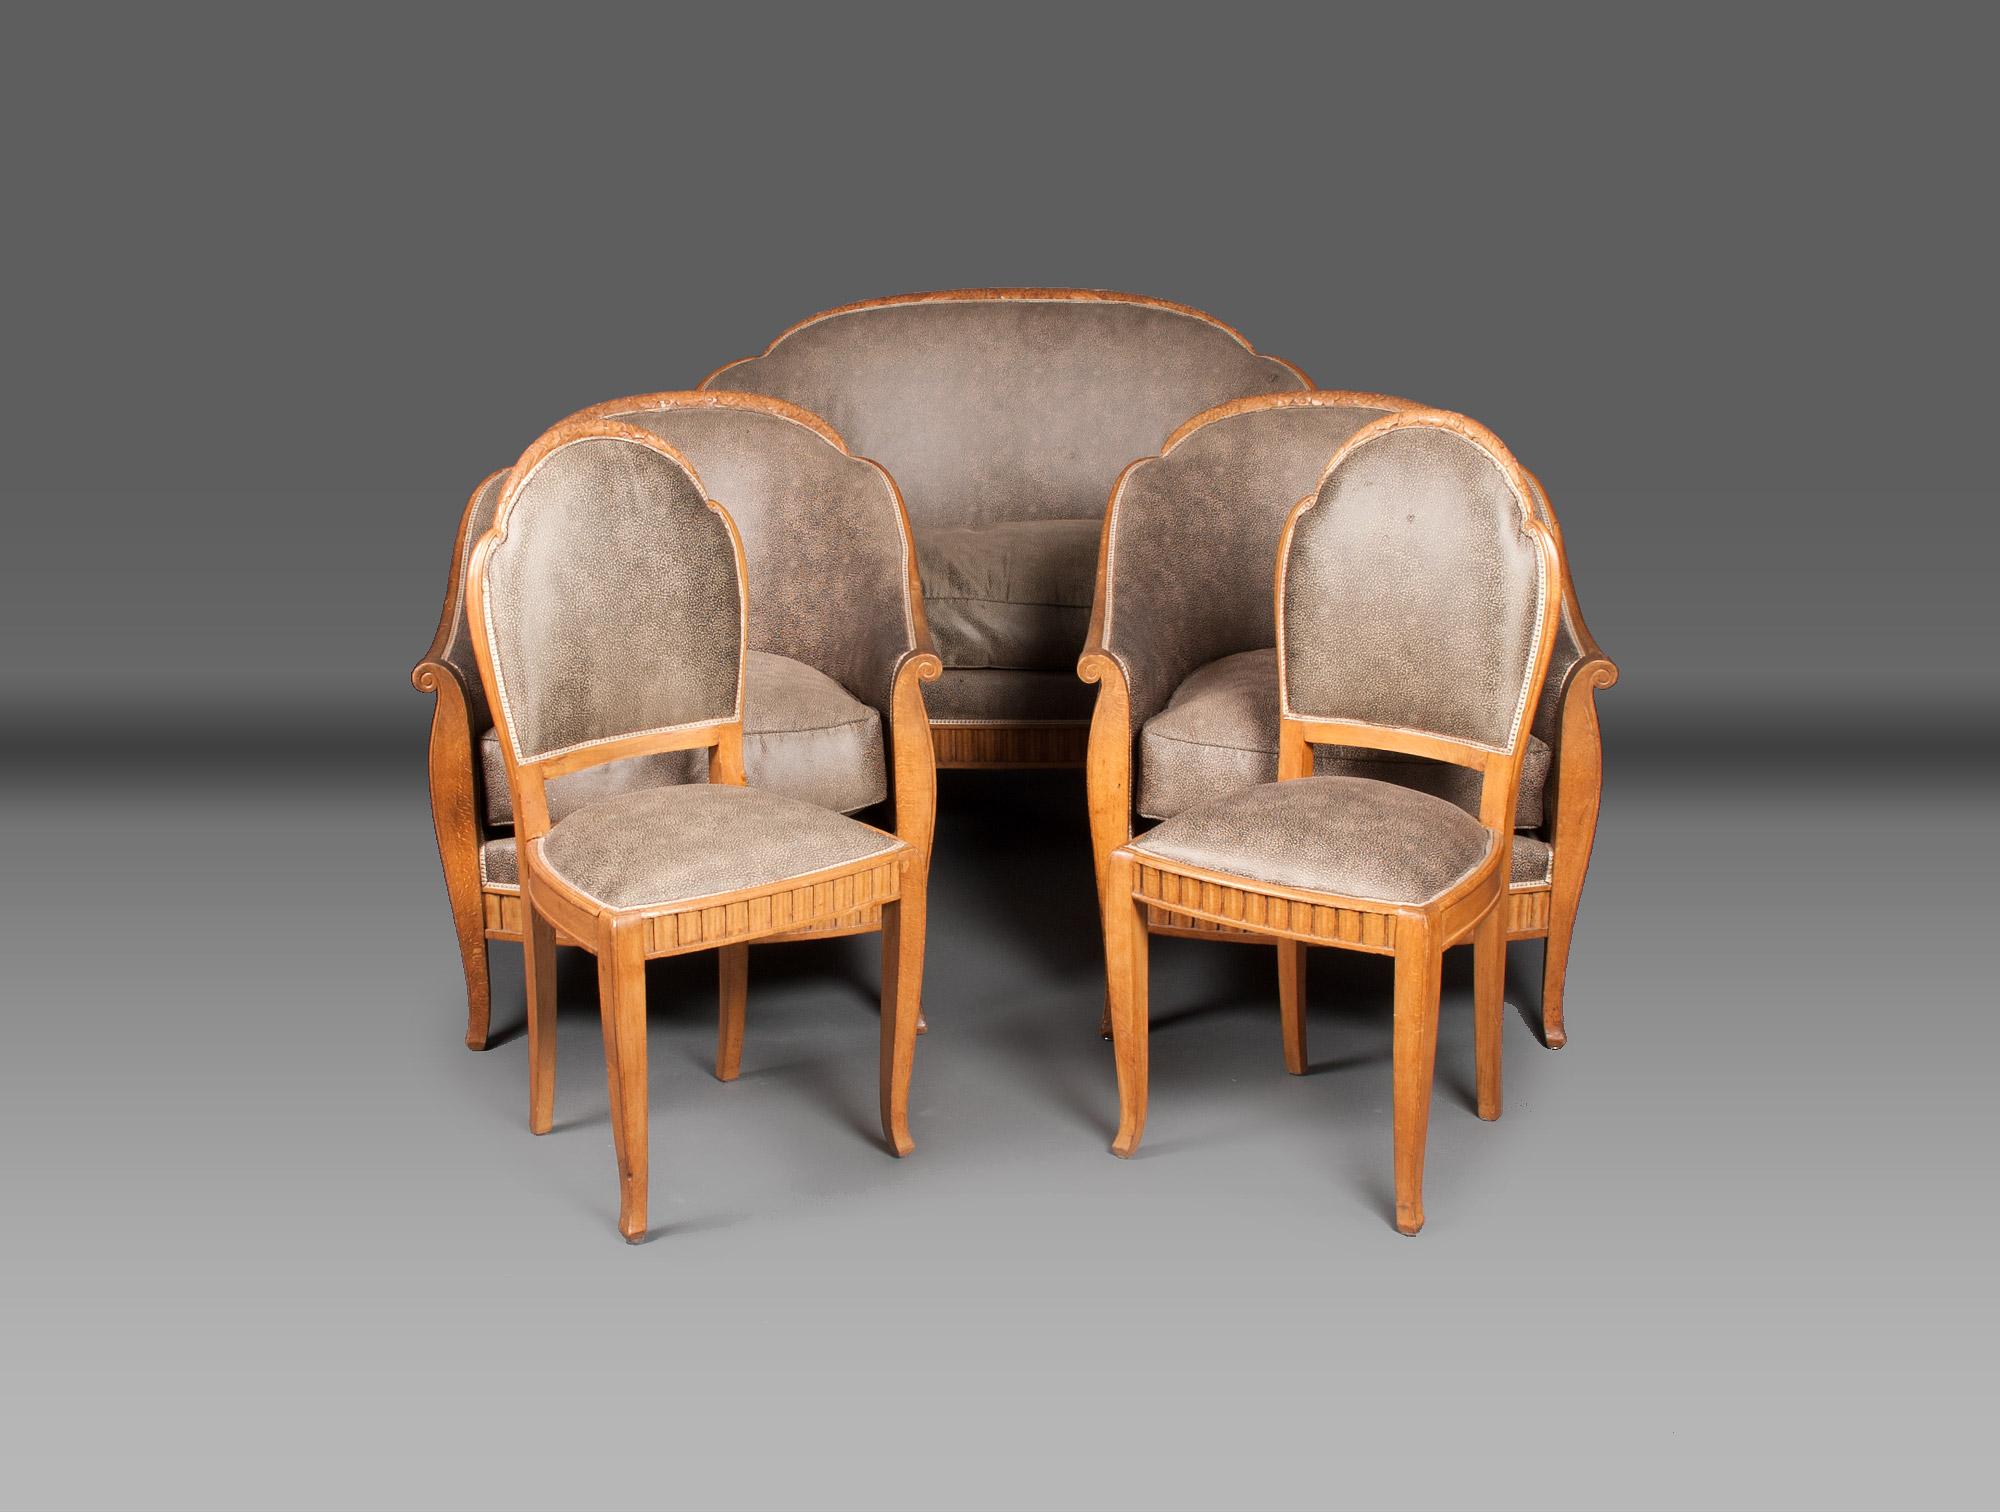 canap art d co galuchat soubrier louer si ges canap. Black Bedroom Furniture Sets. Home Design Ideas